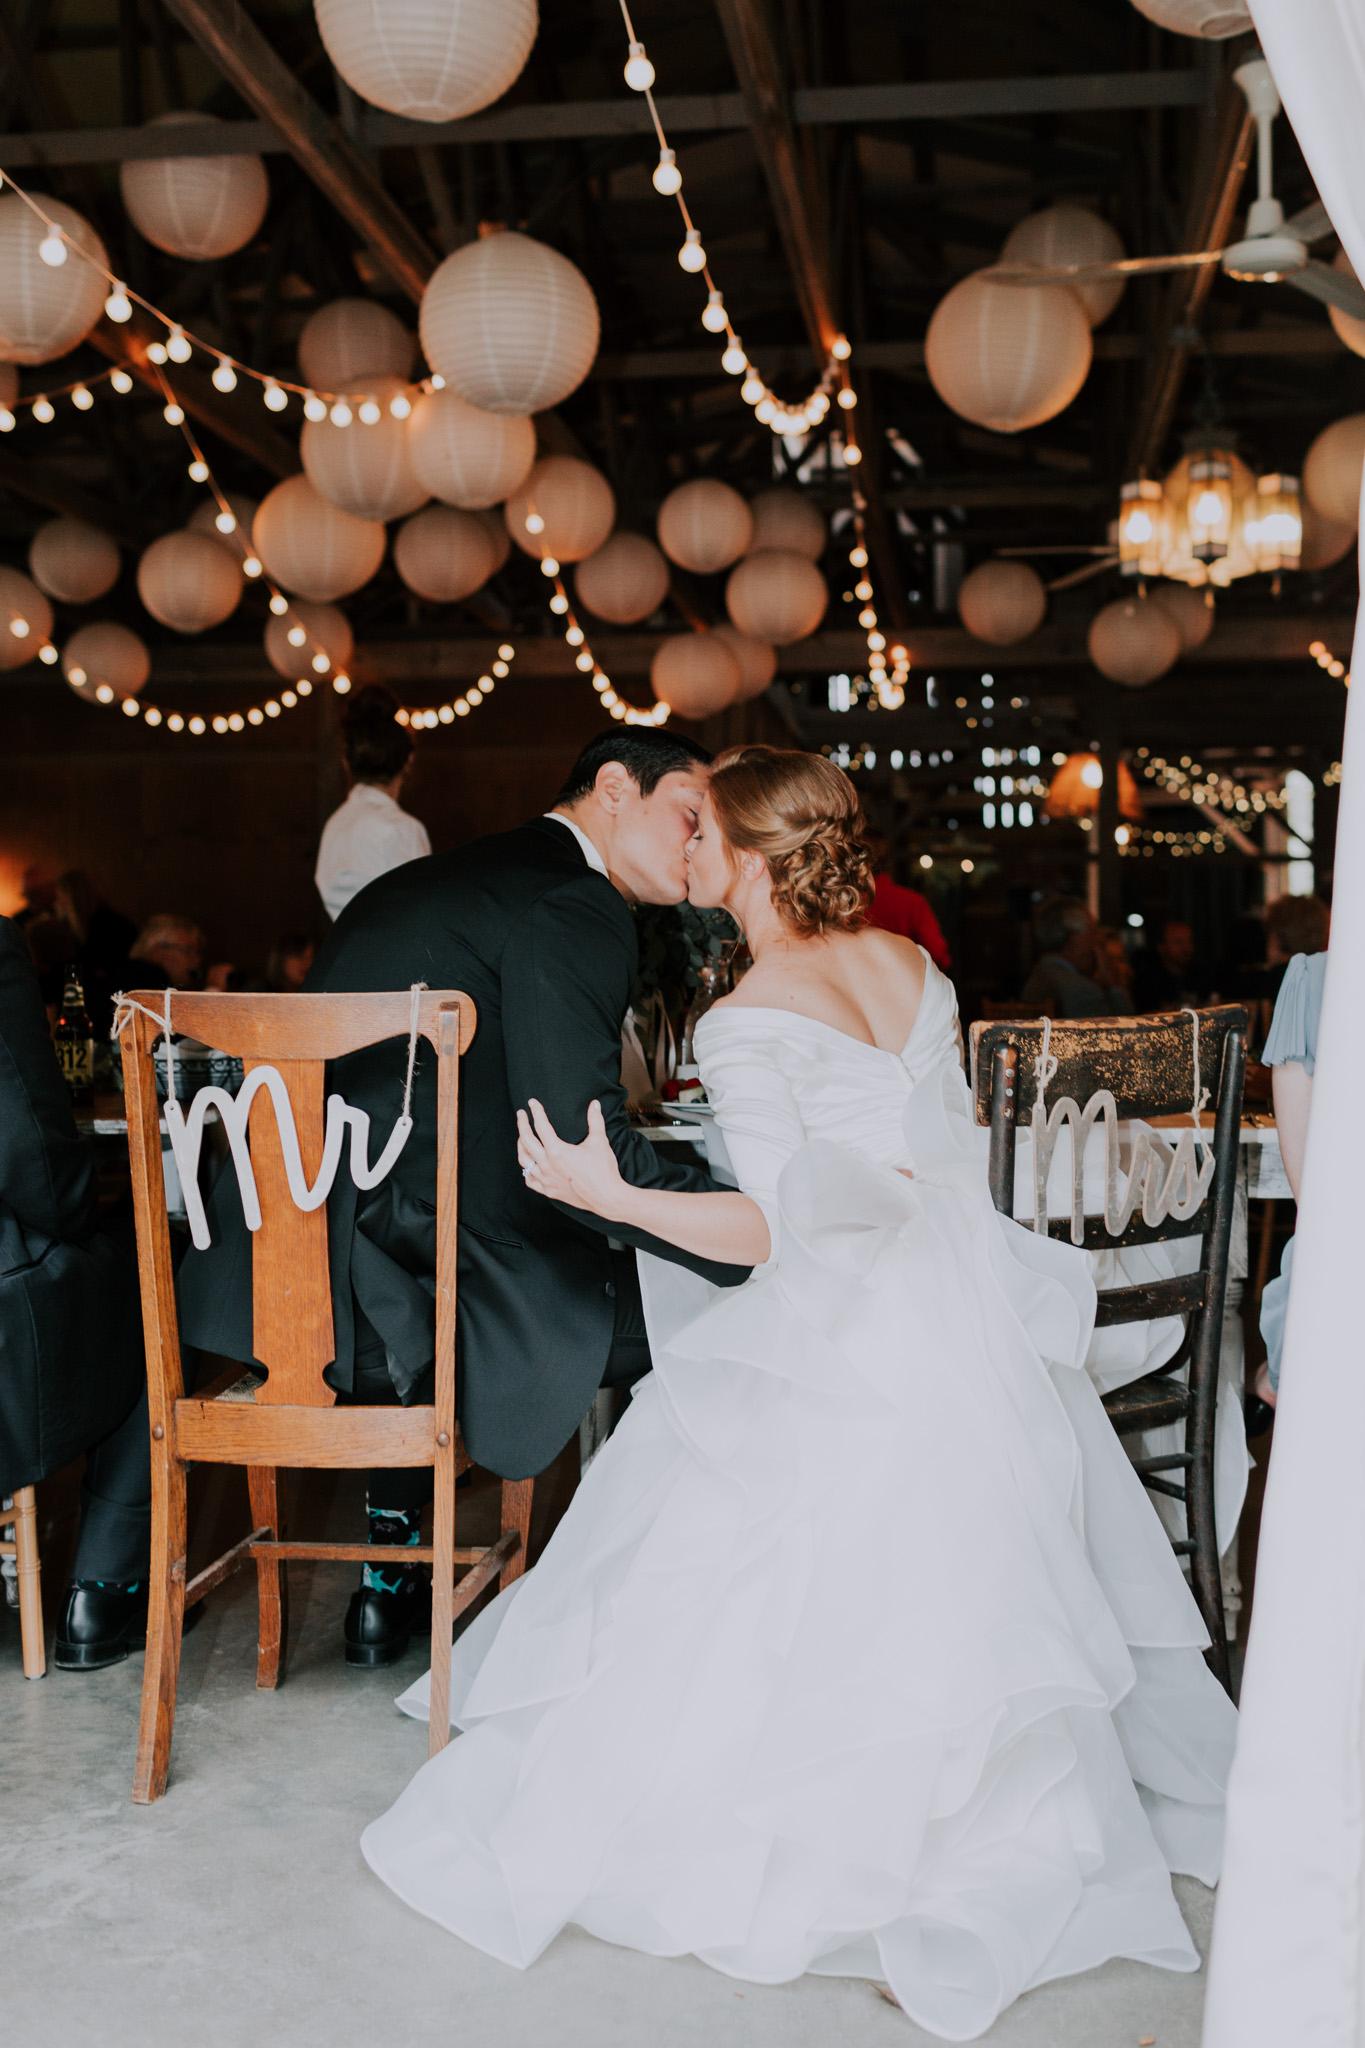 MillCreek-Wilde-Wedding-Barn-Michigan-Eliza-Eric-Vafa-Photo942.jpg